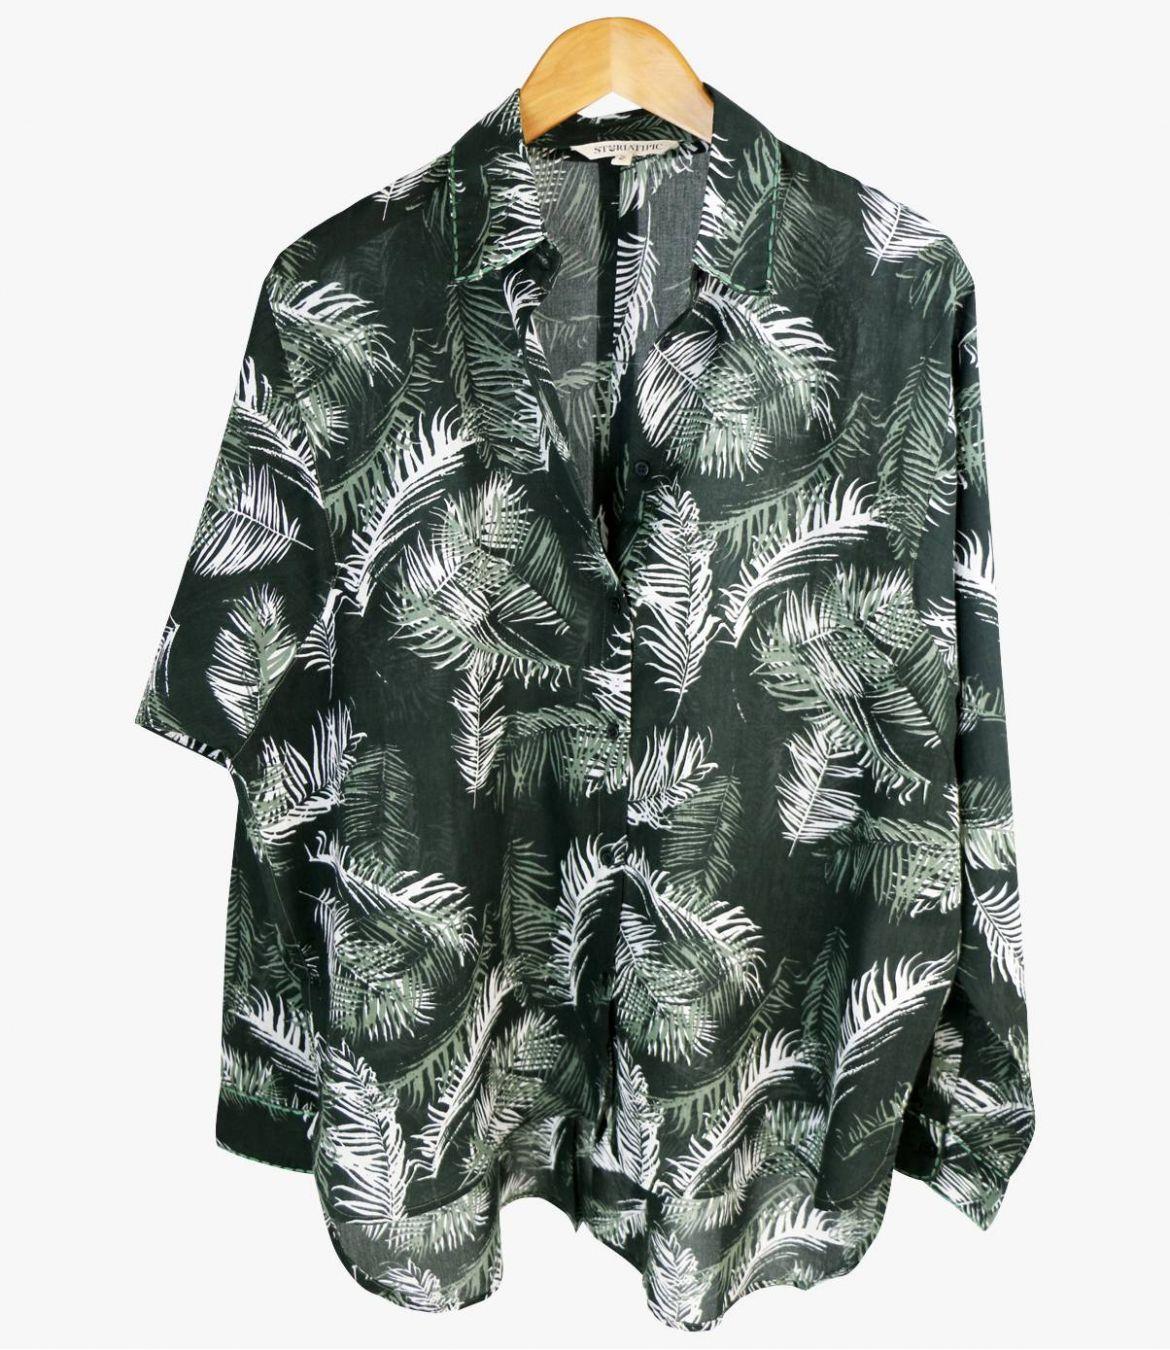 COSY PALOMA Cotton Shirt for Women Storiatipic - 1